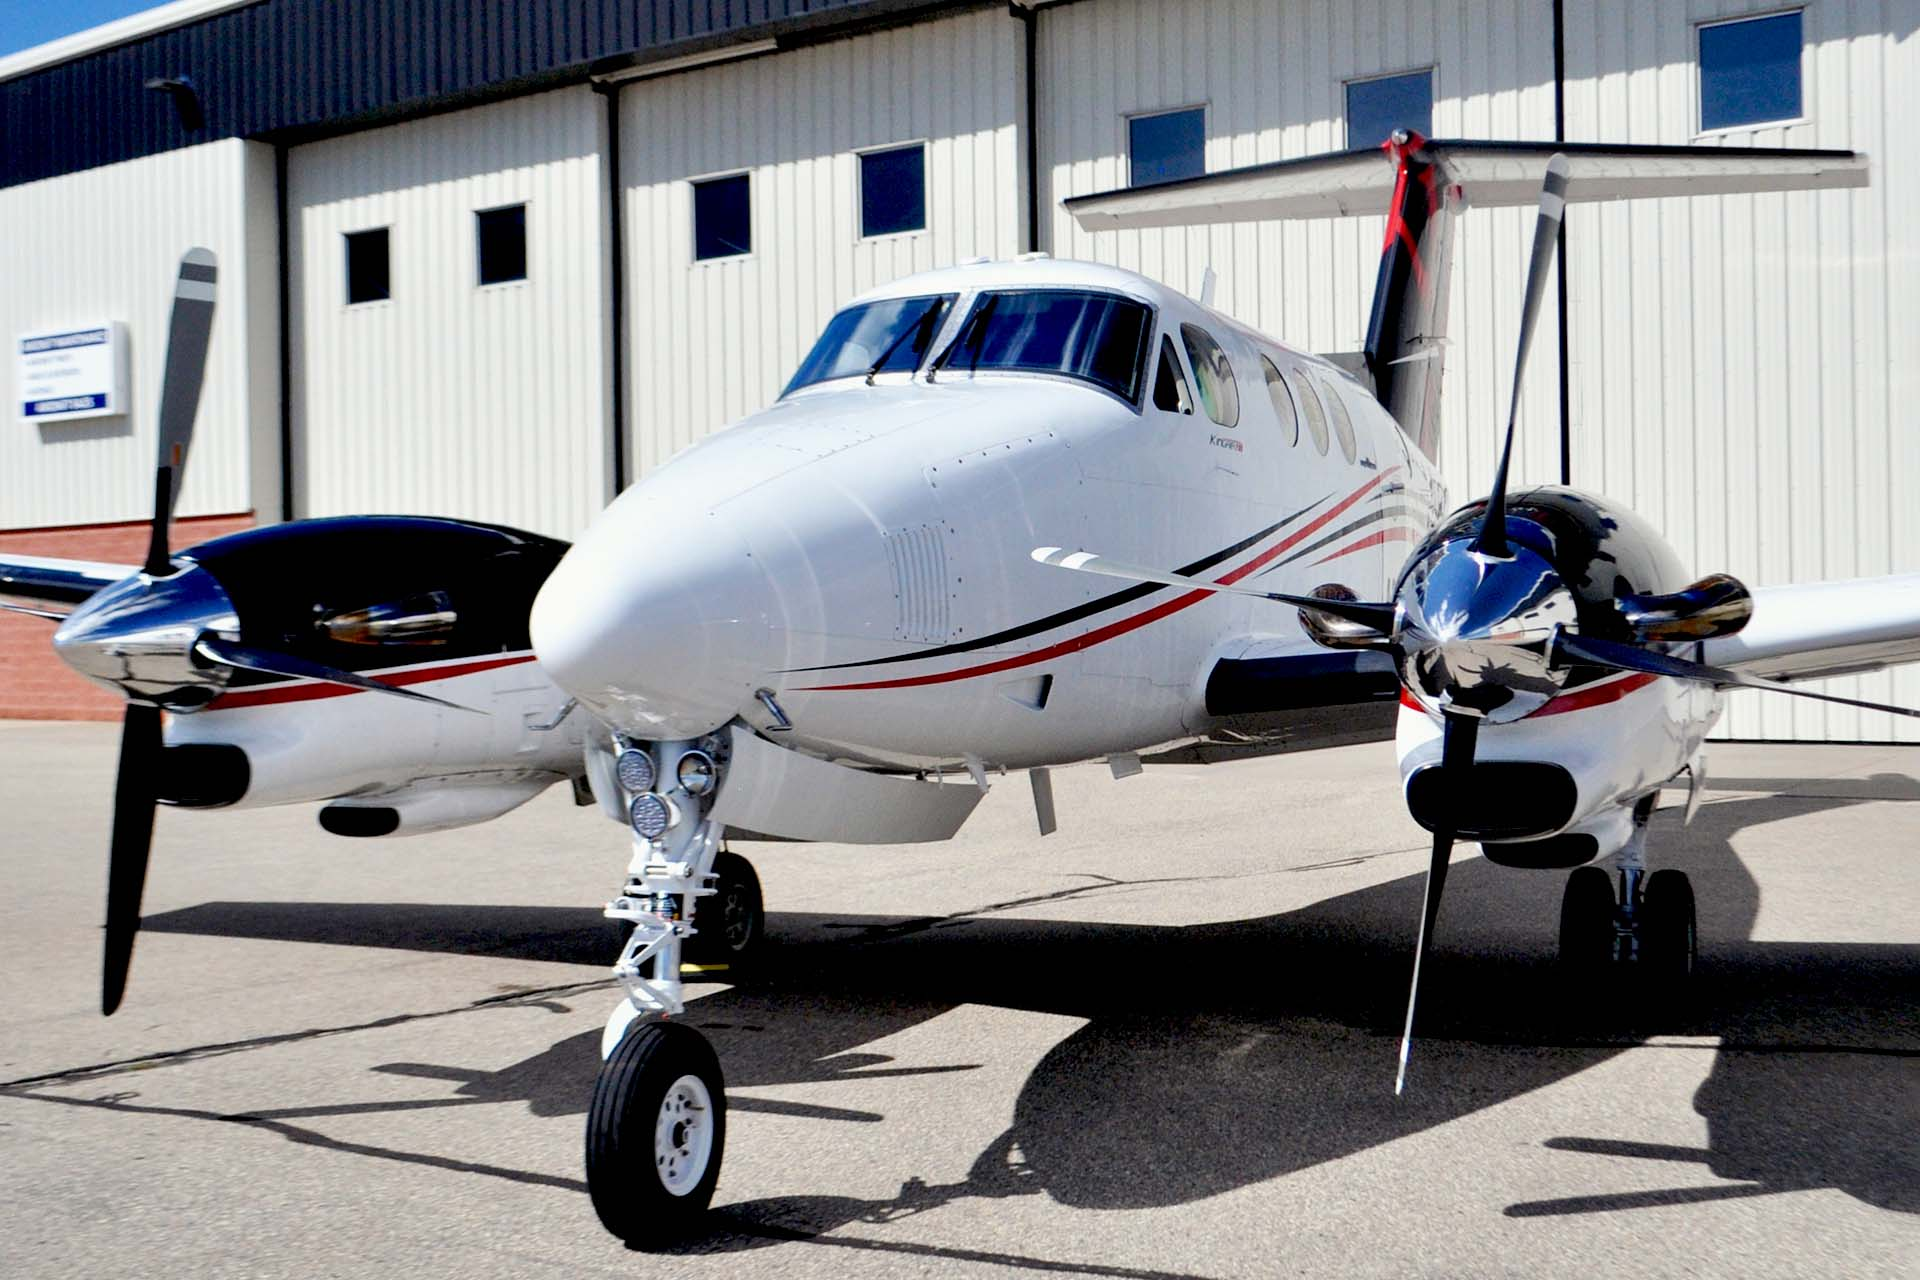 king air 90 paint refurbishment premier jet center kfcm